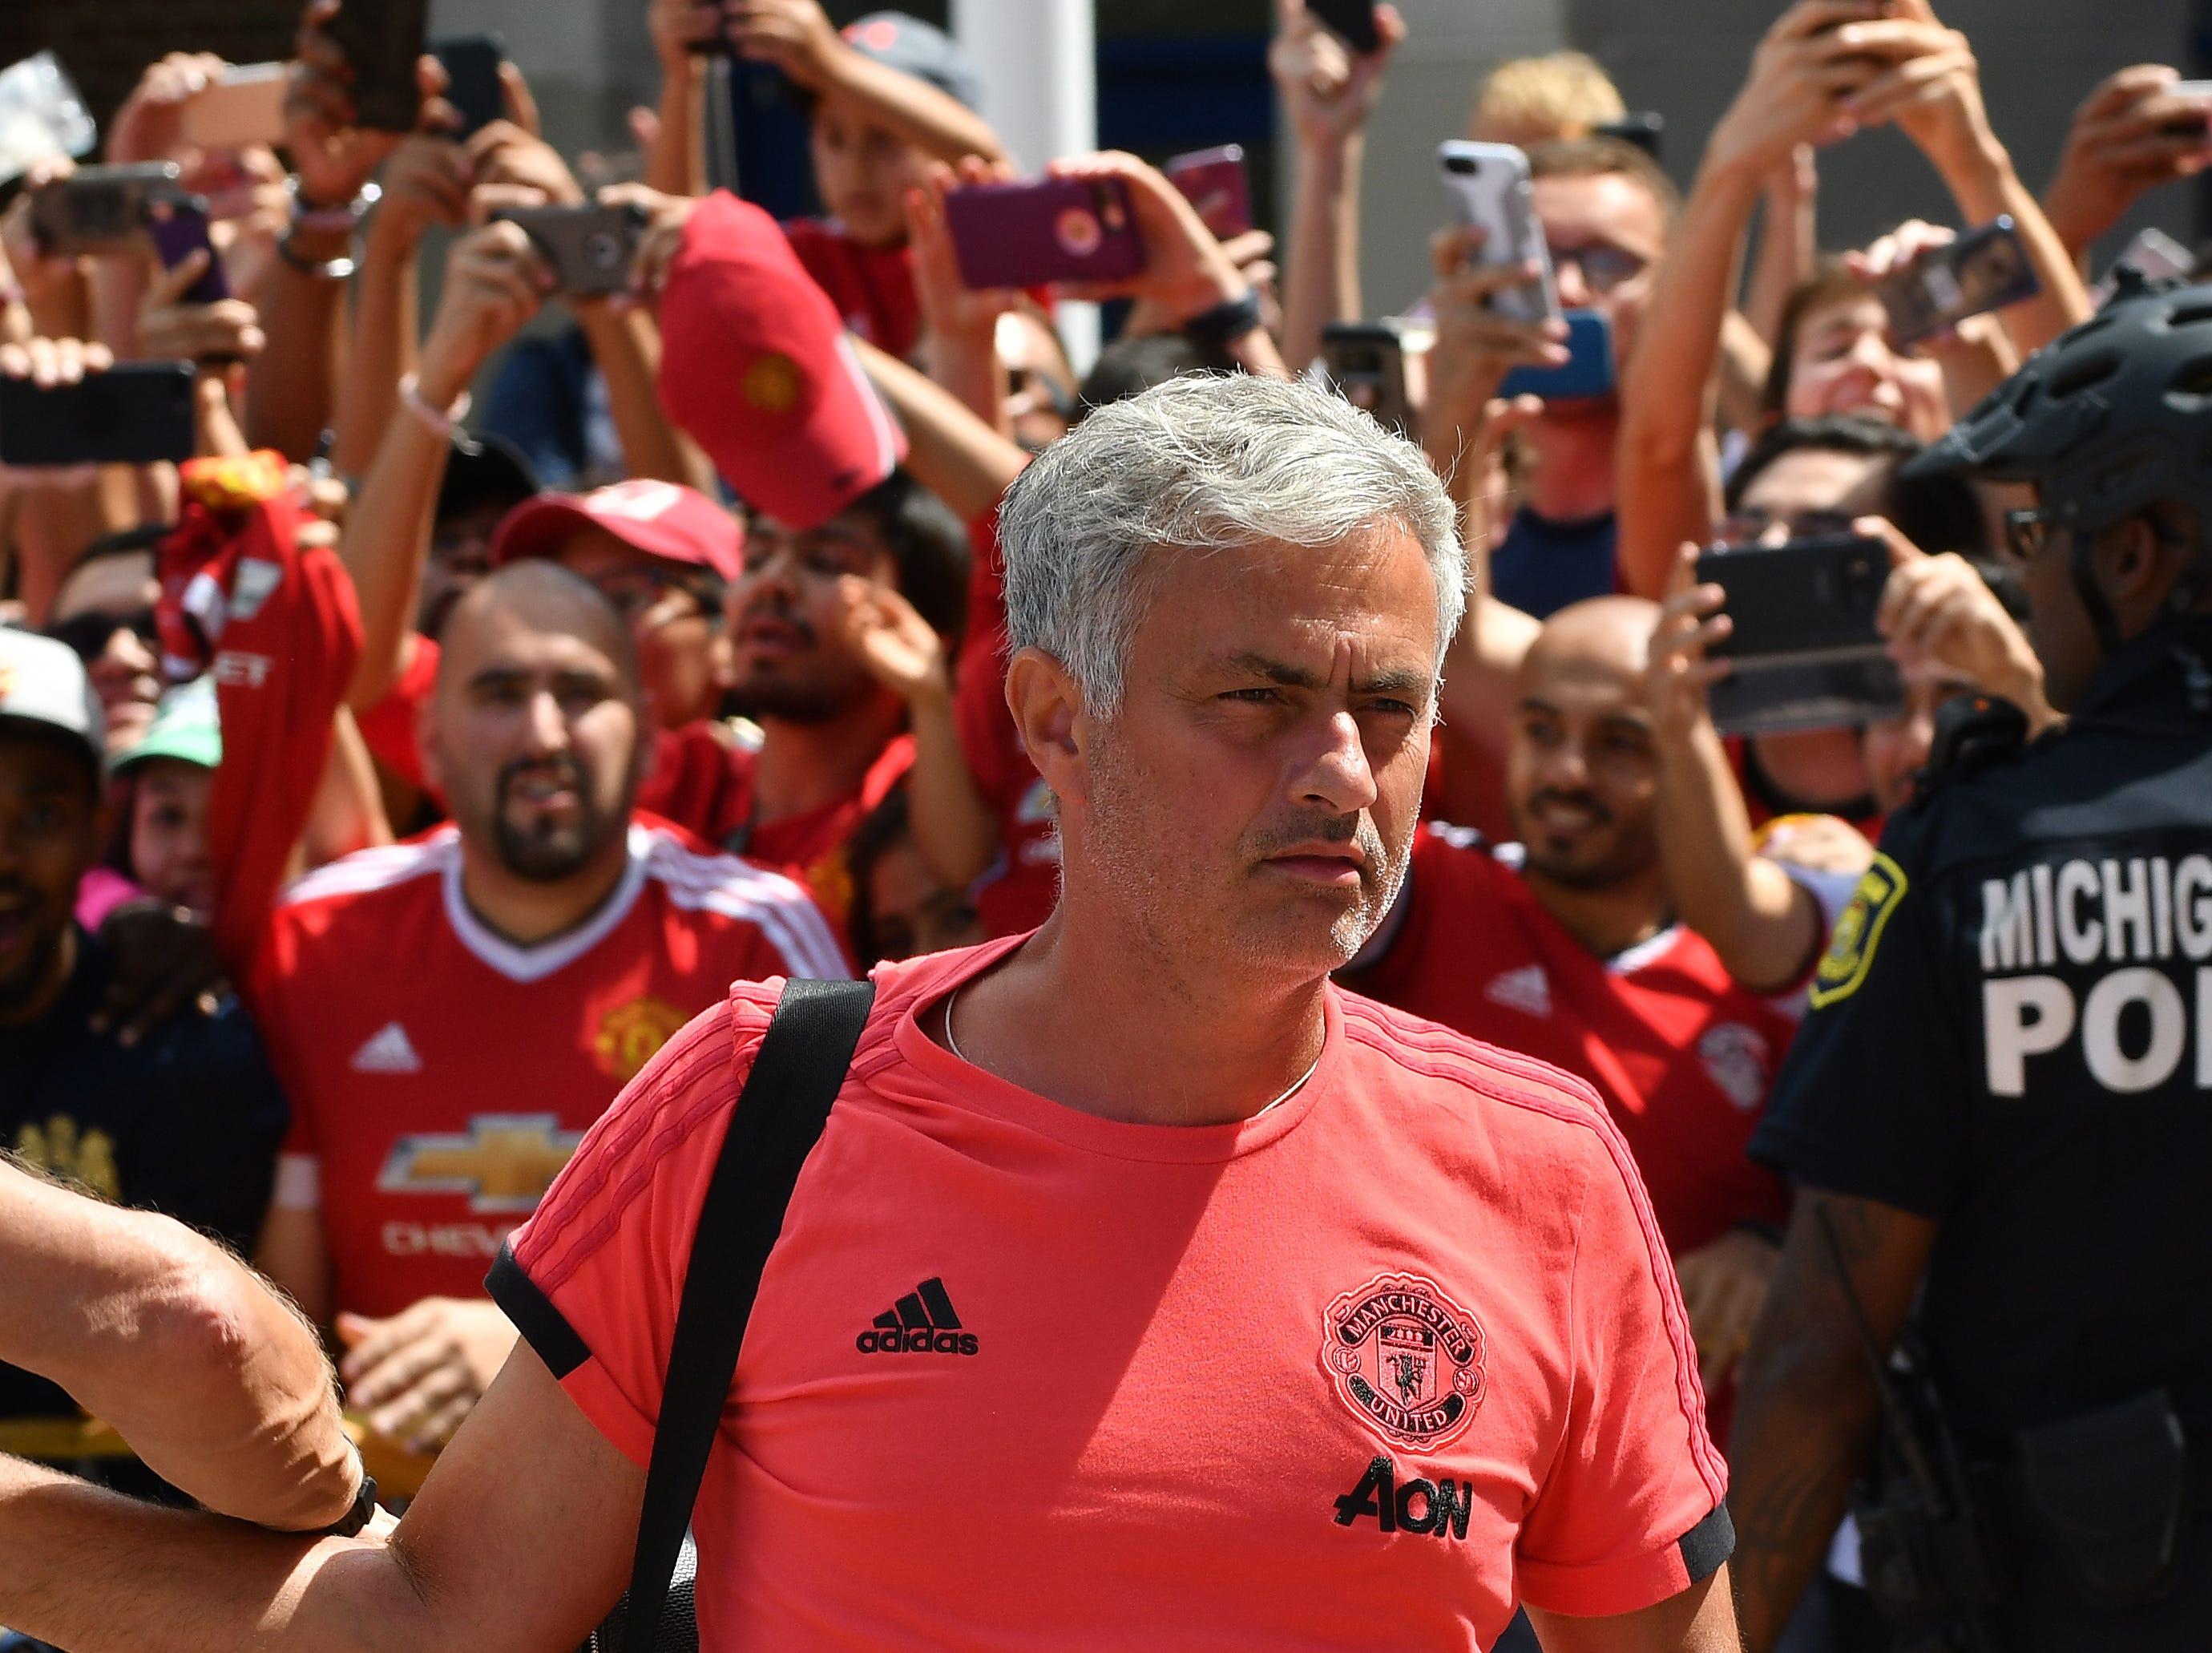 Manchester United head coach Jose Mourinho arrives to the stadium.